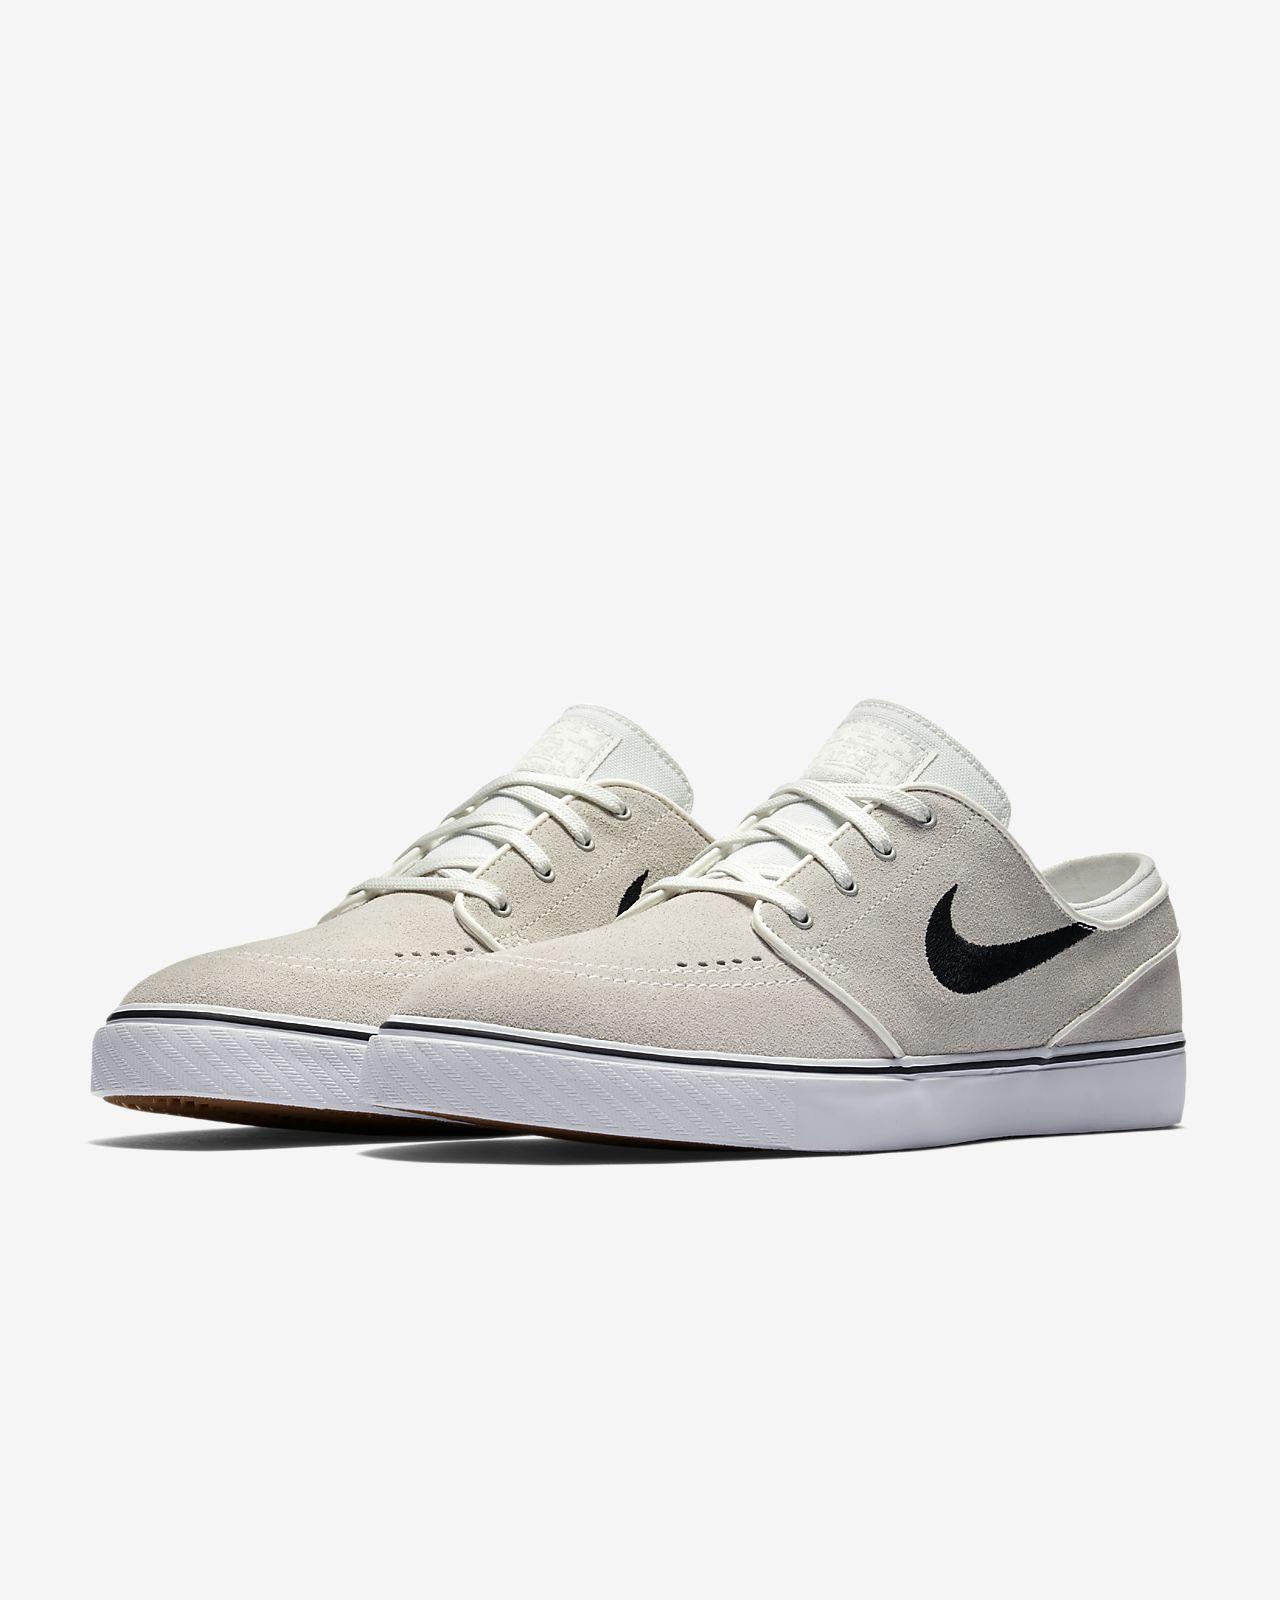 Nike SB Zoom Stefan Janoski Summit Blanco Negro 333824 108